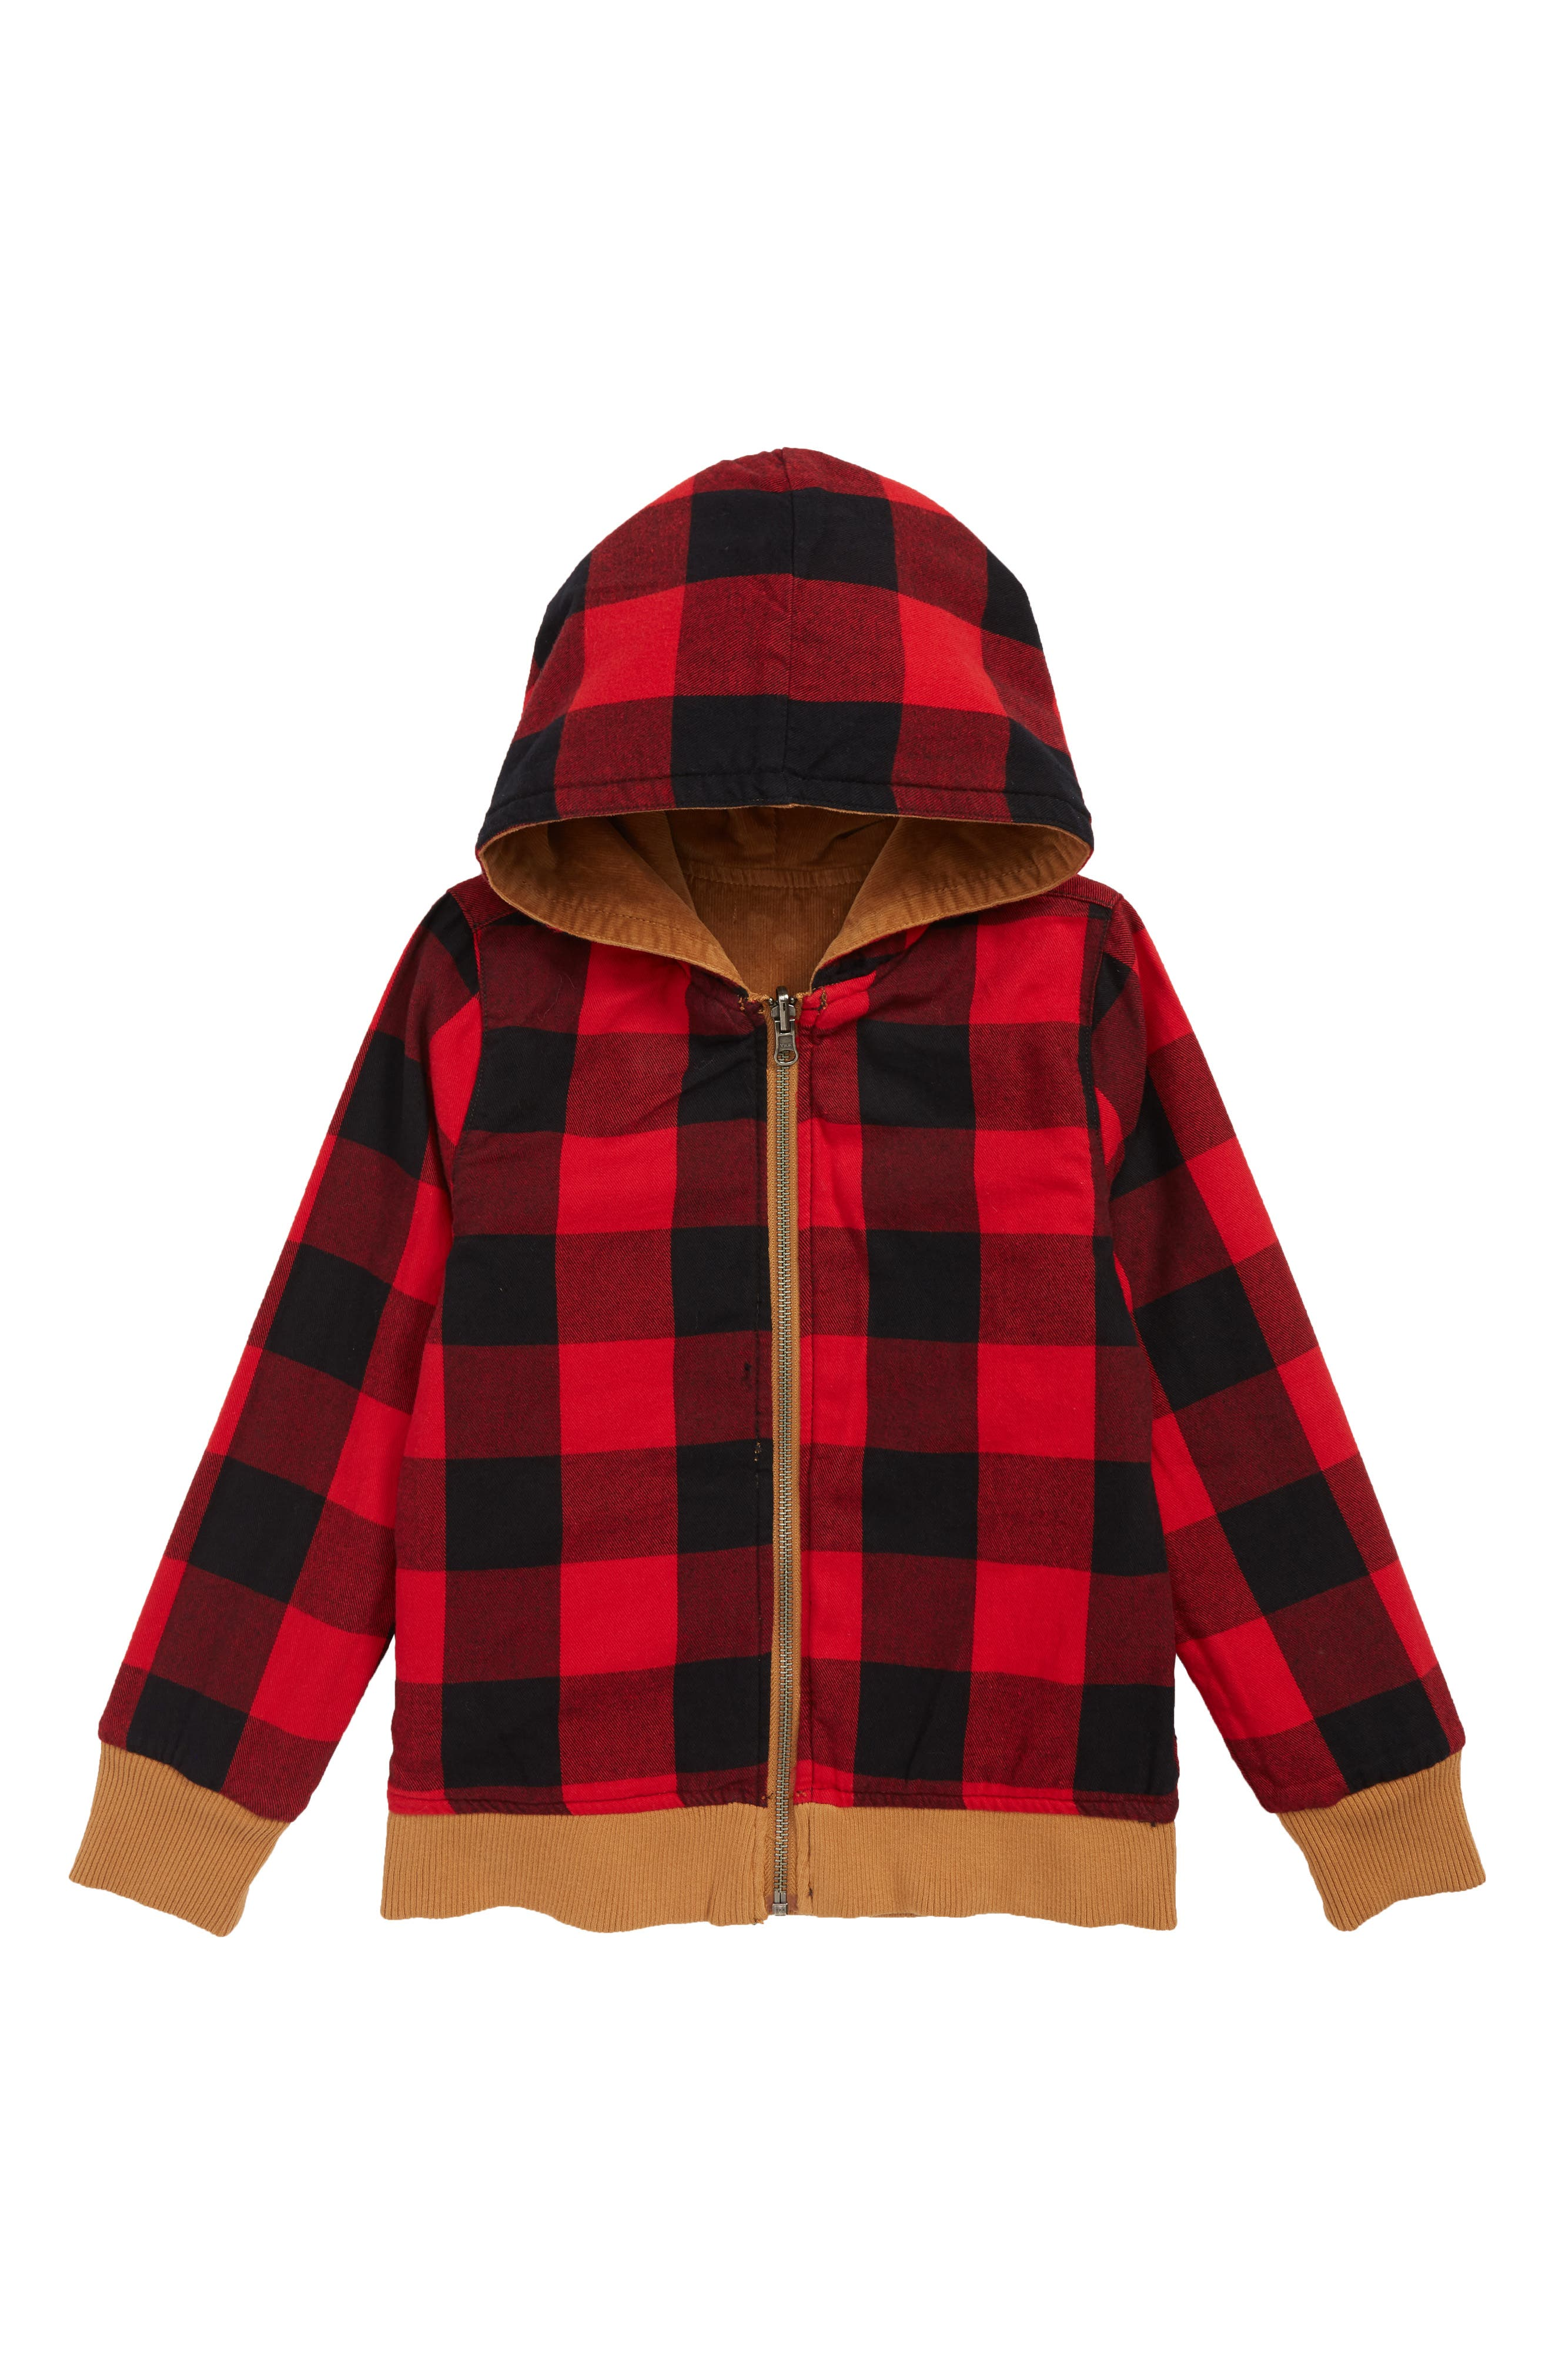 Reversible Corduroy/Plaid Hooded Jacket,                             Alternate thumbnail 2, color,                             TAN DALE